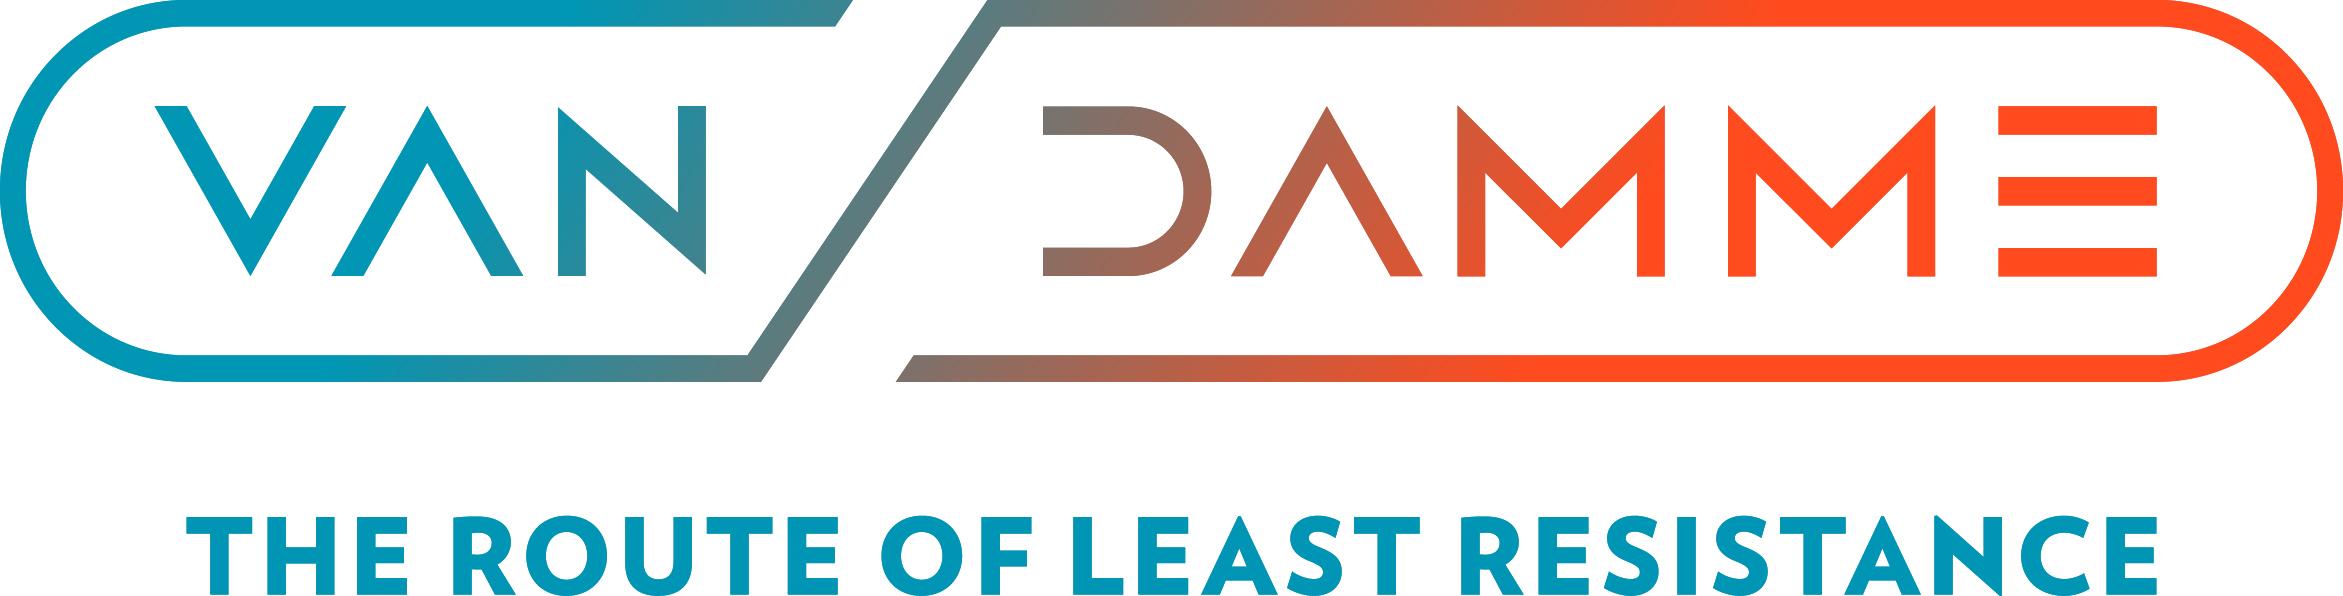 Van Damme Cable logo